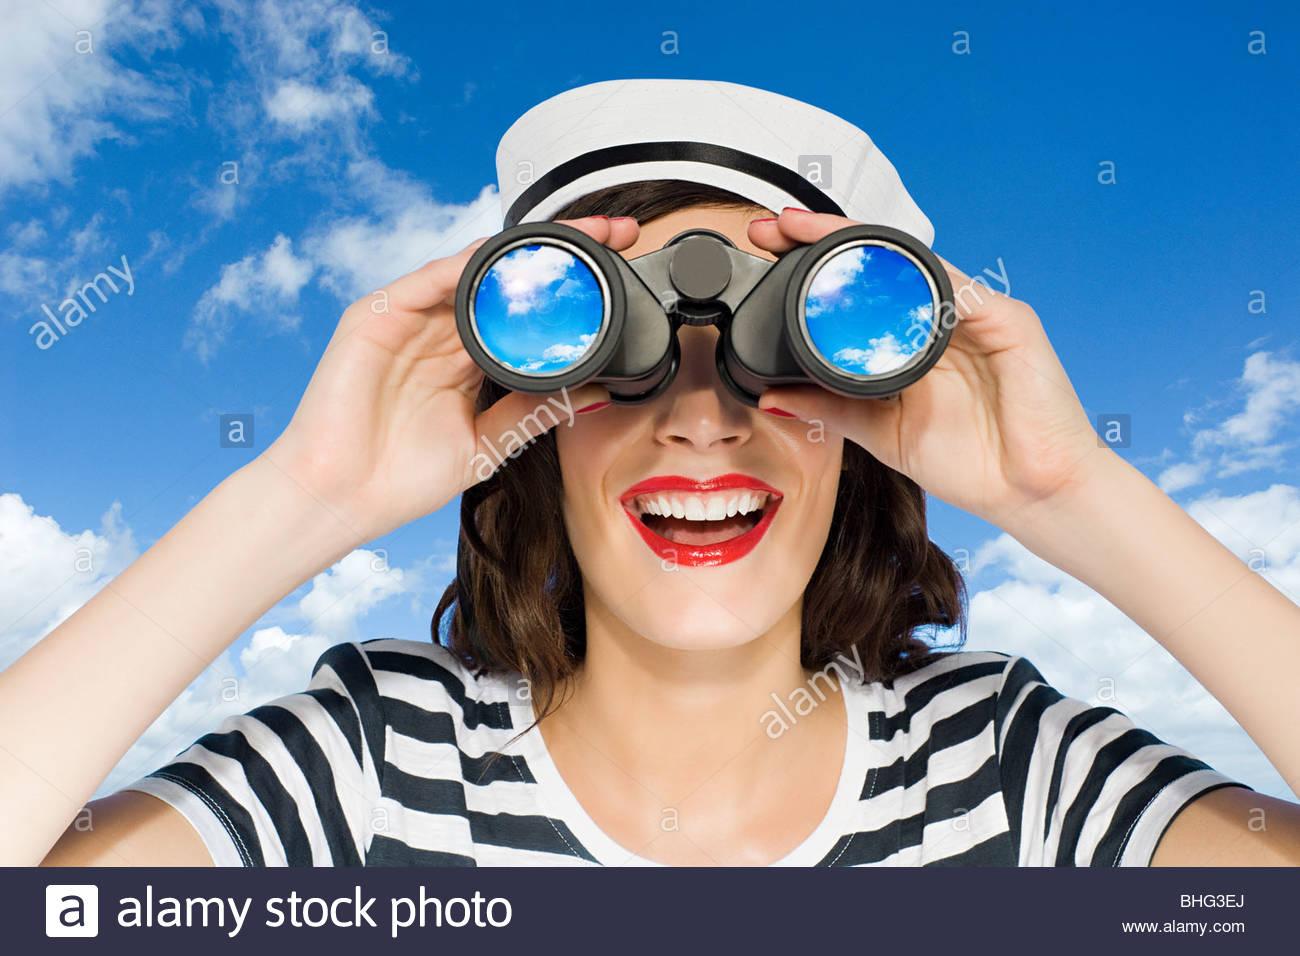 Woman with binoculars - Stock Image